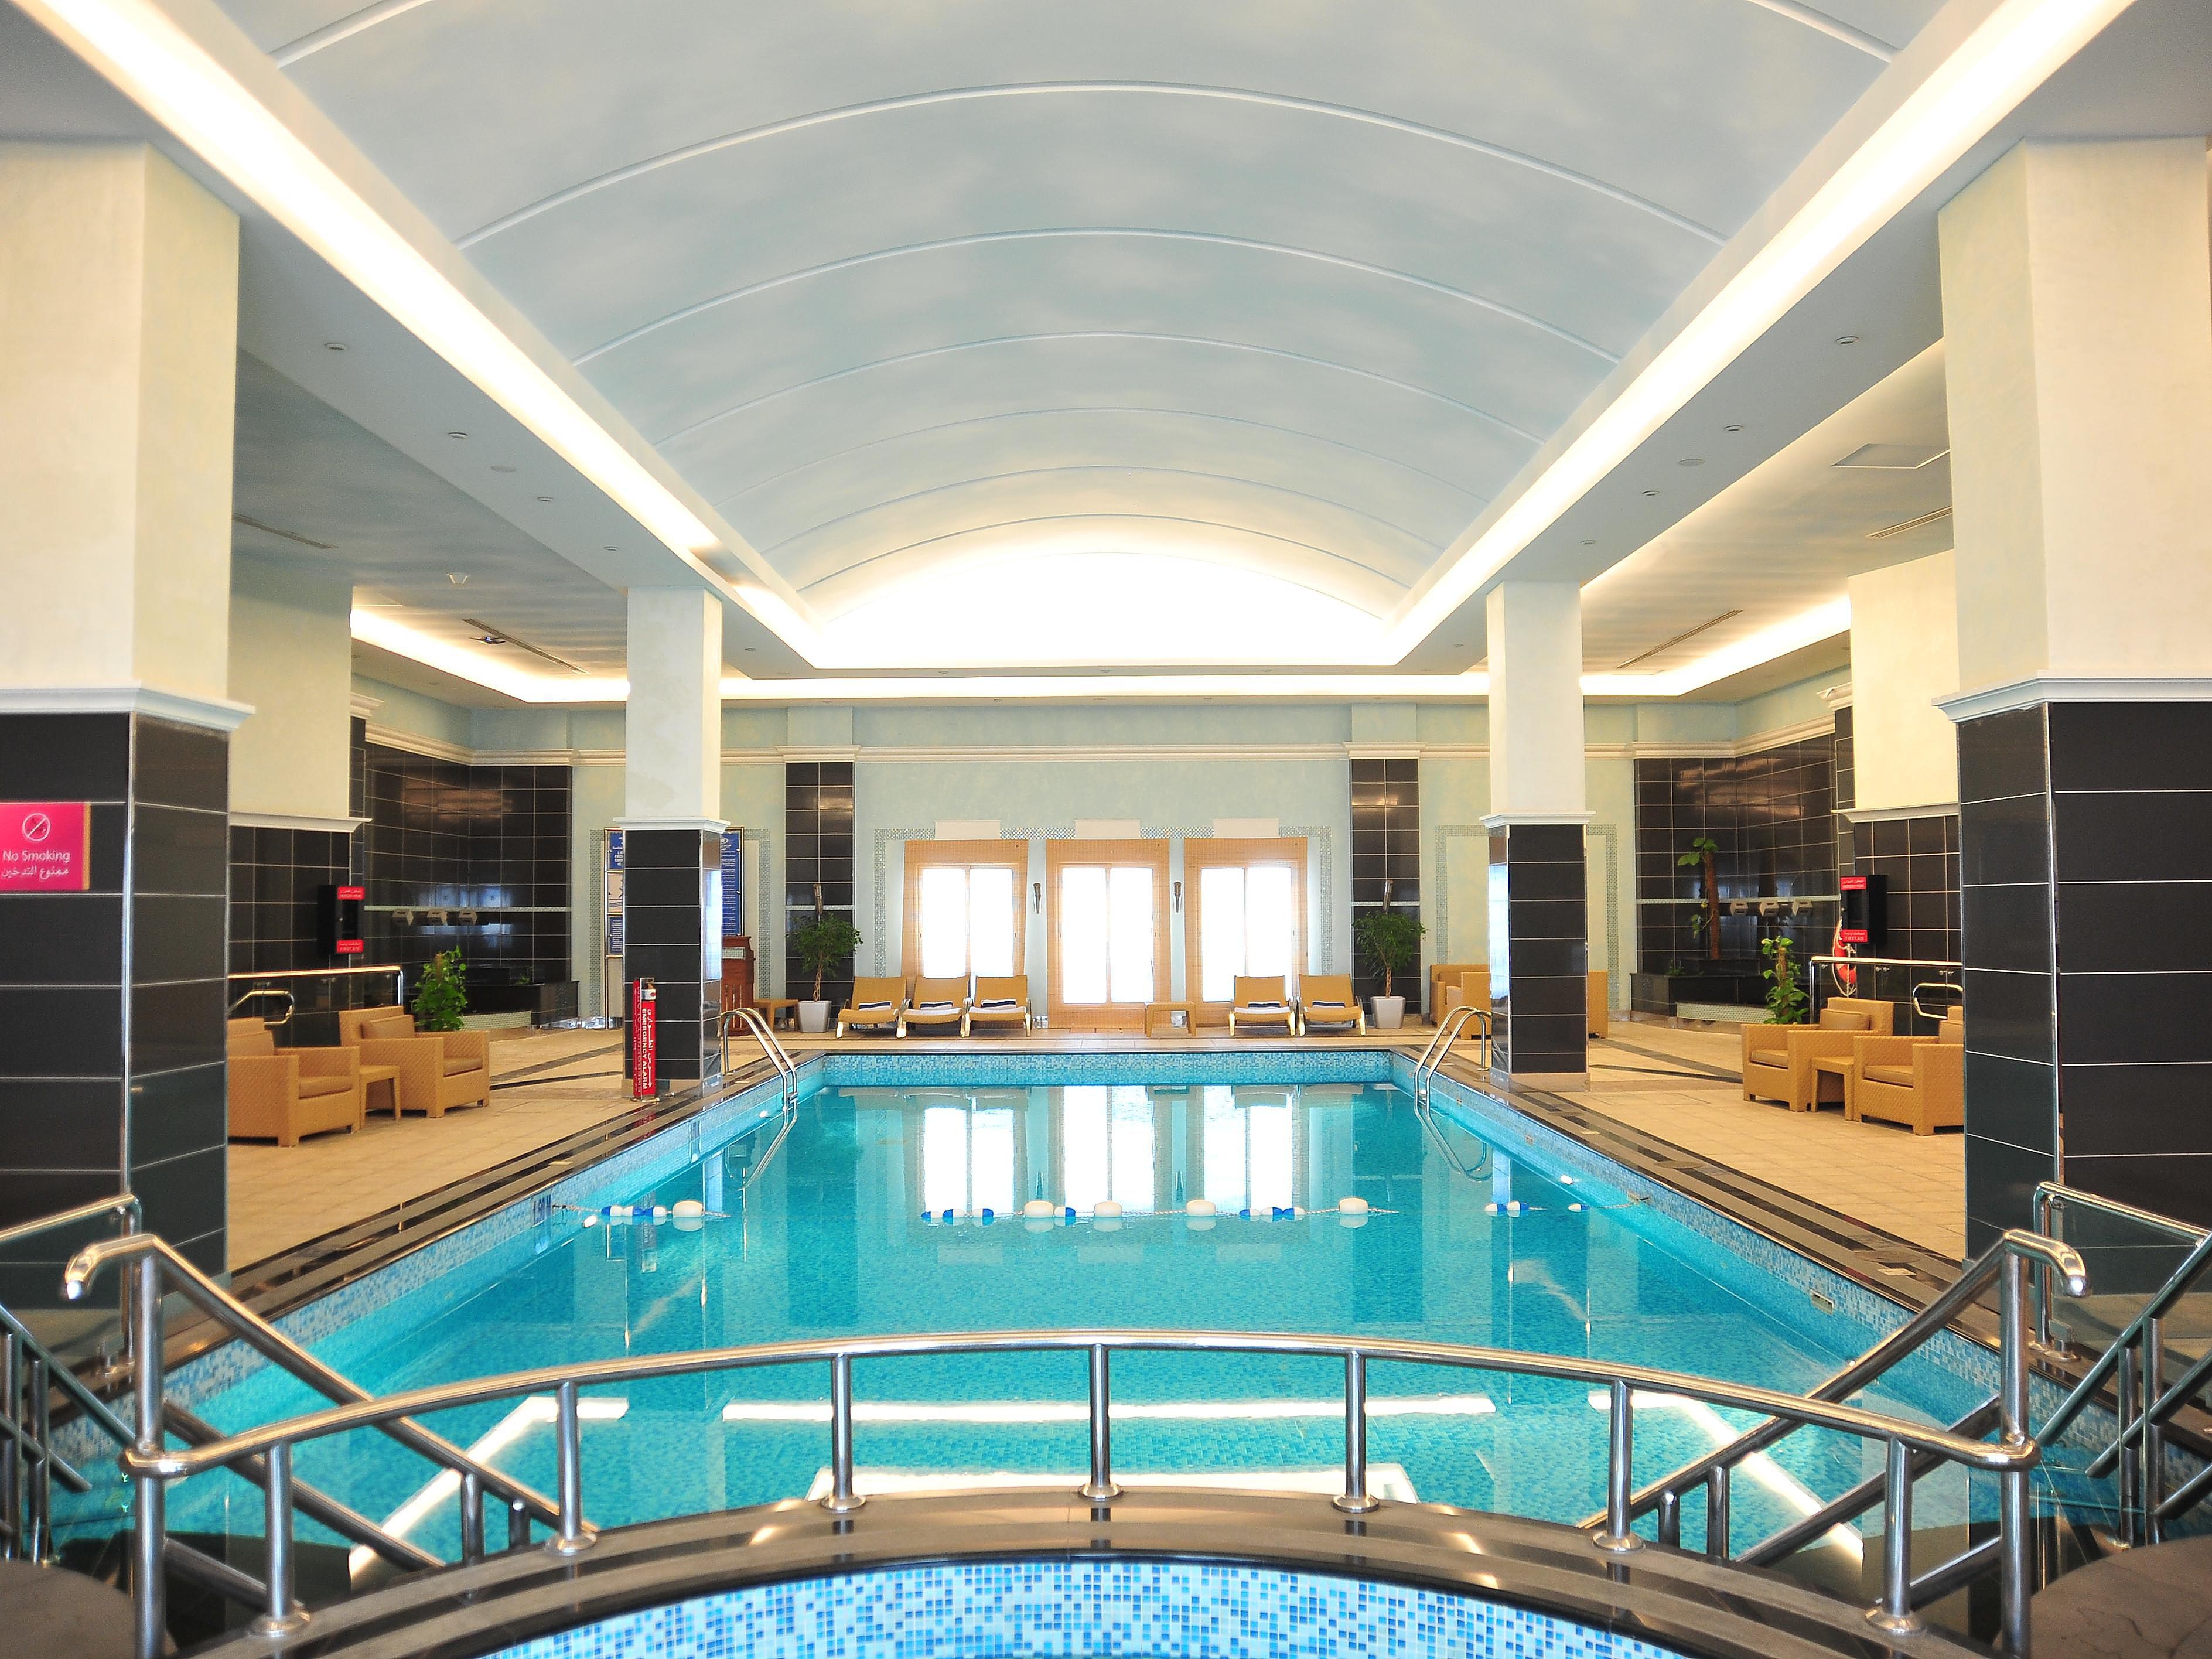 Crowne Plaza Al Khobar Health and Fitness Facilities